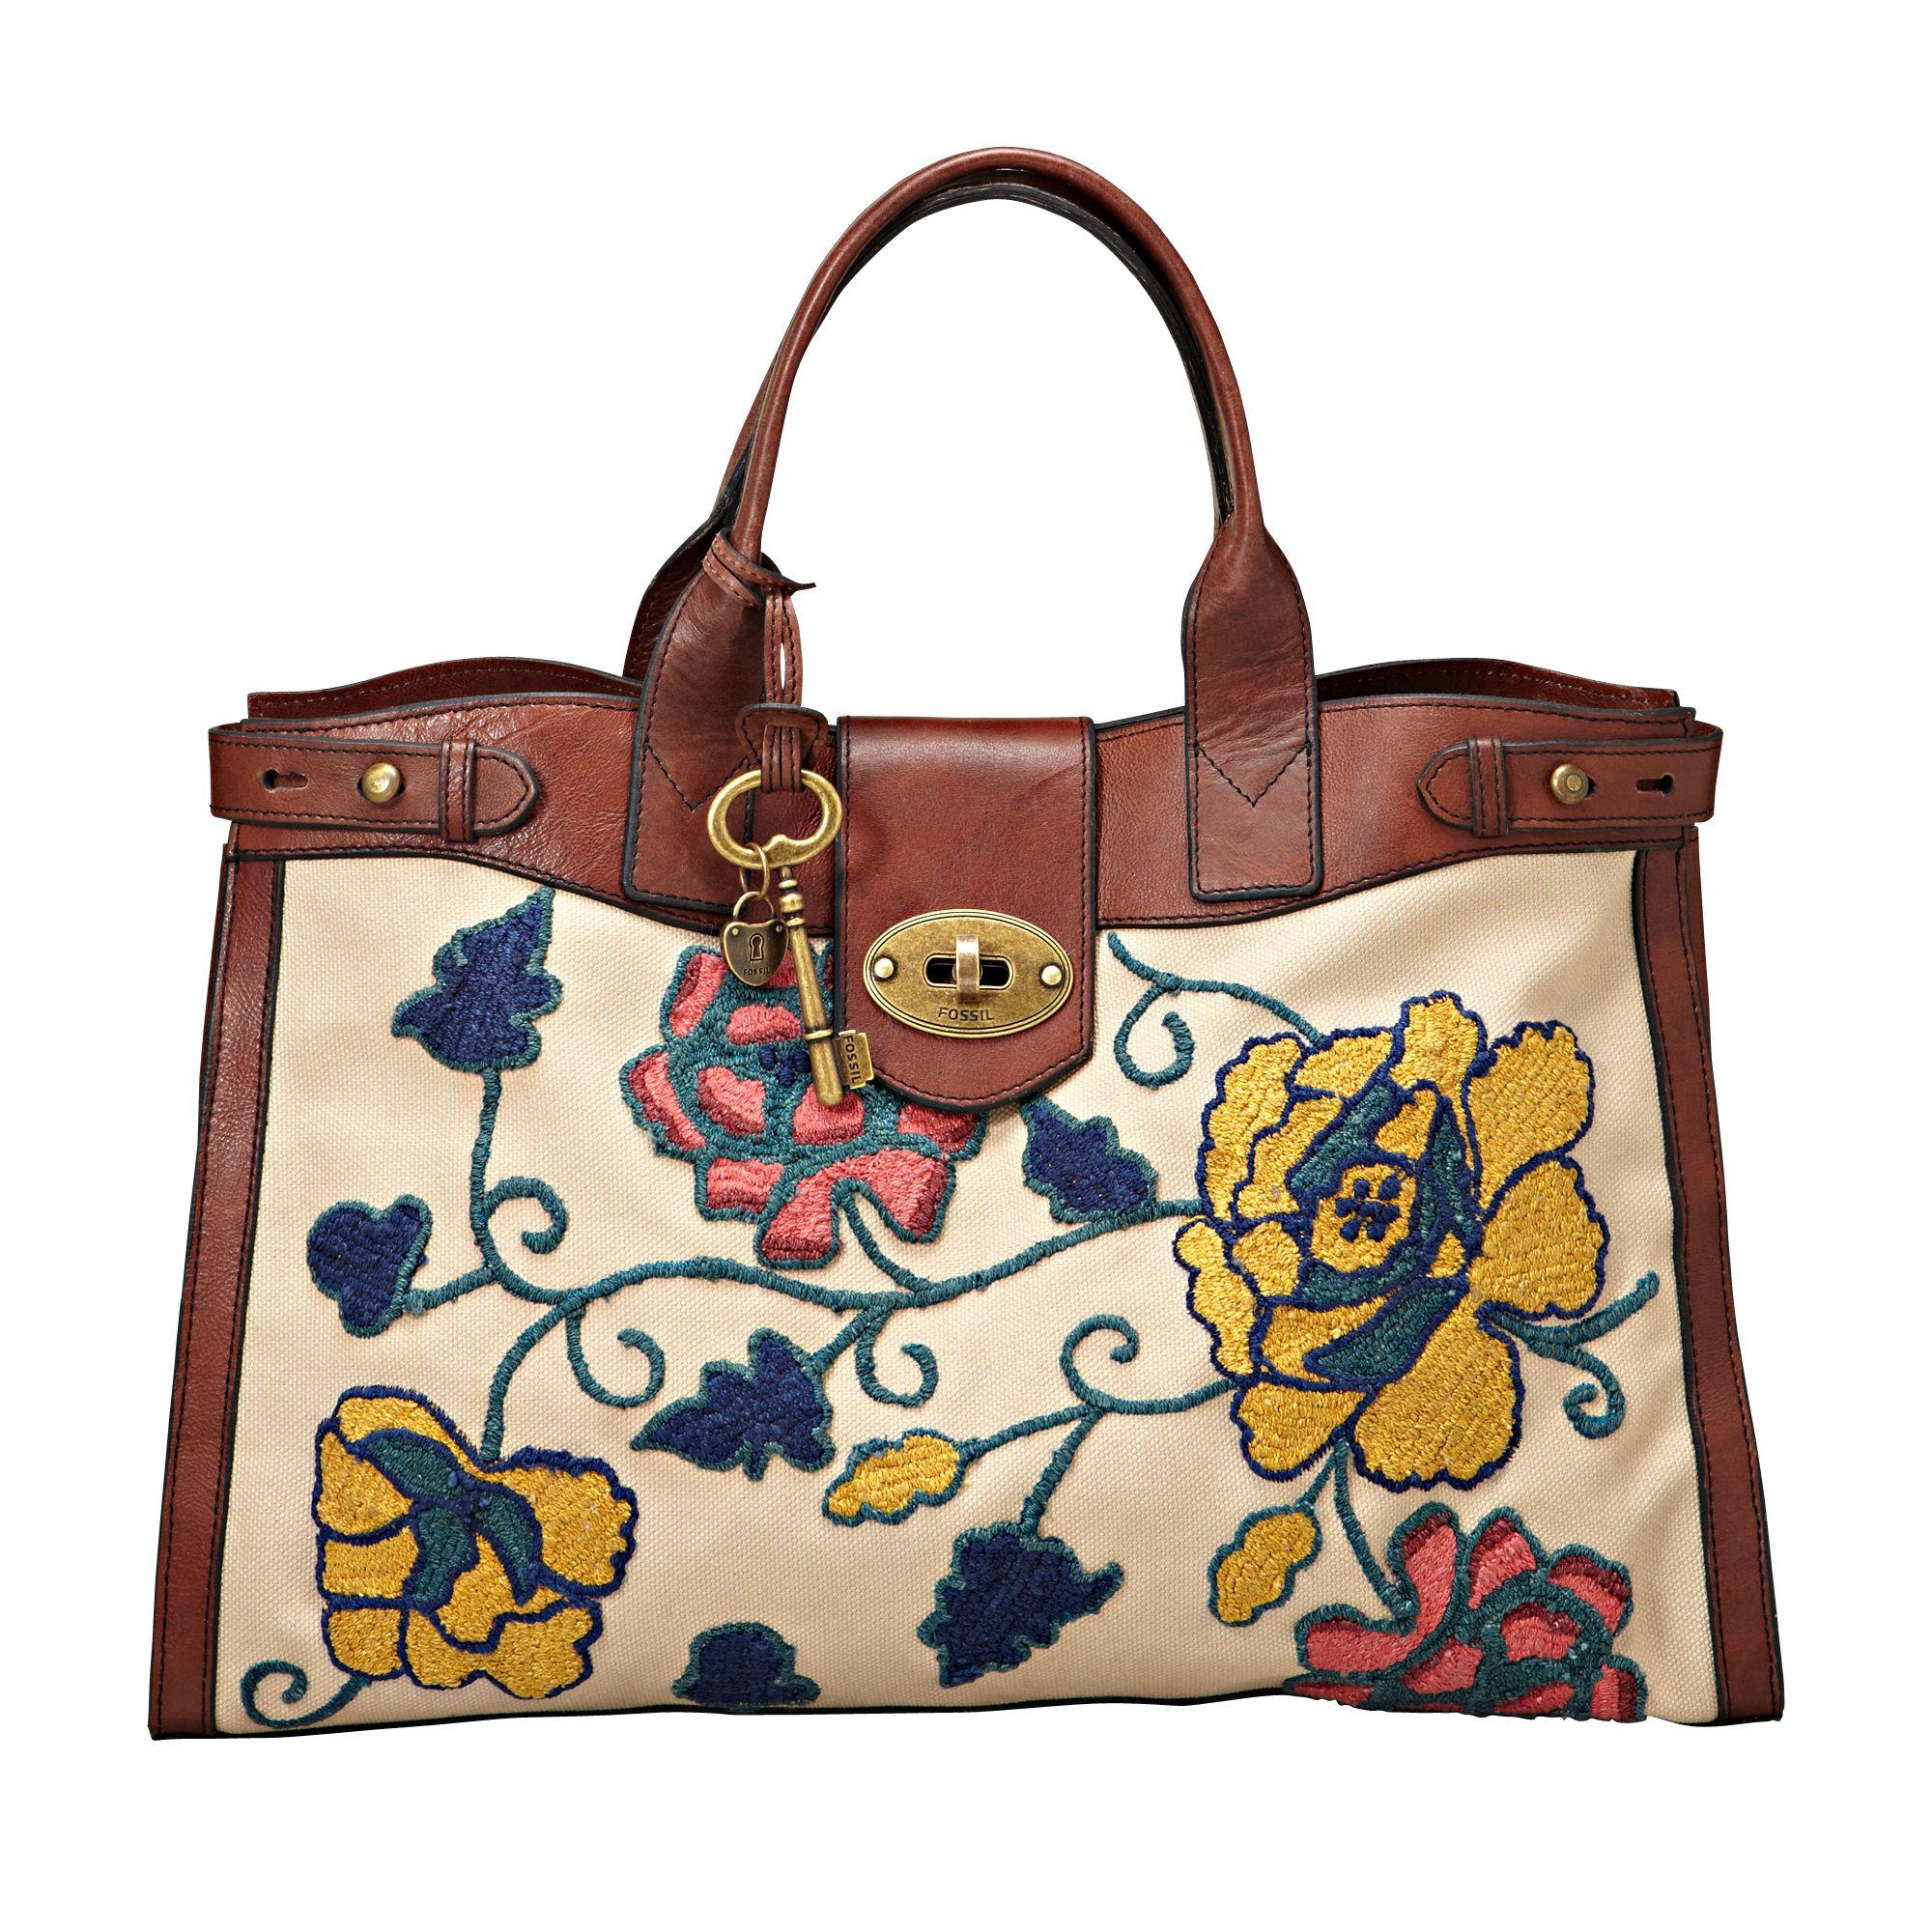 Fossil Re-Issue Vintage Weekender Handbag, Multicoloured at John Lewis